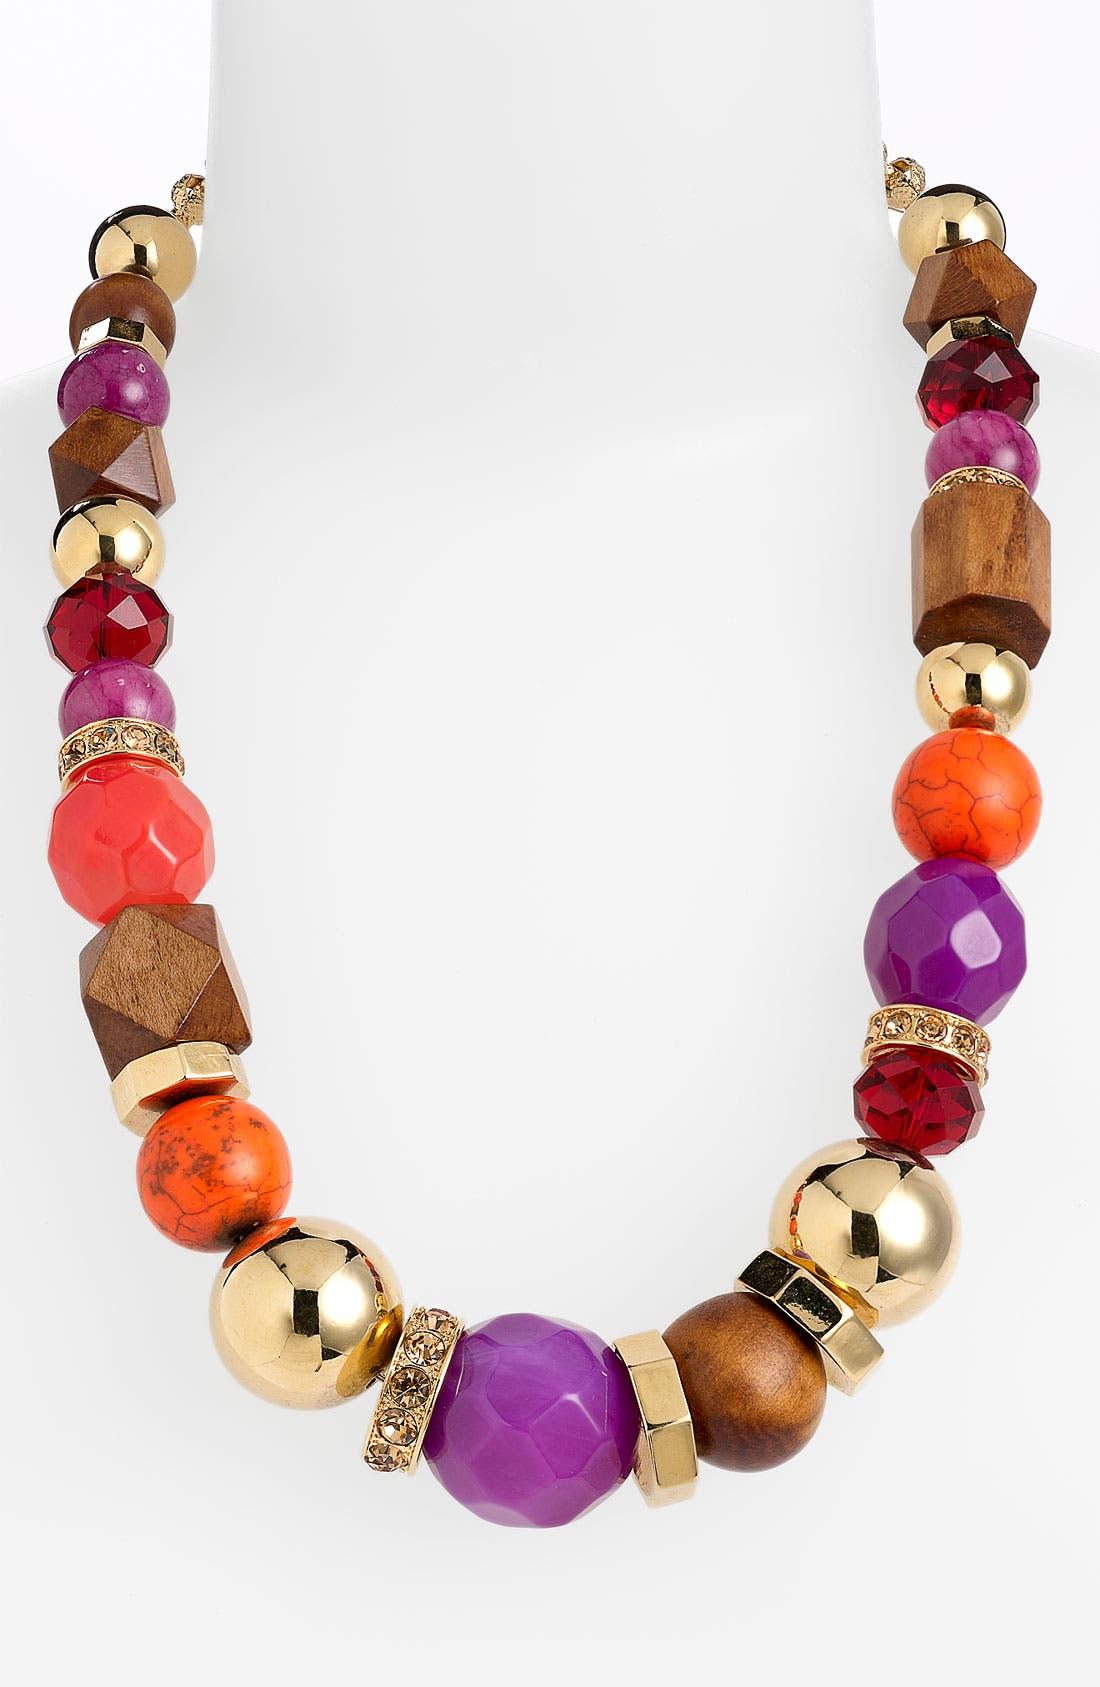 Main Image - kate spade new york 'totem park' necklace